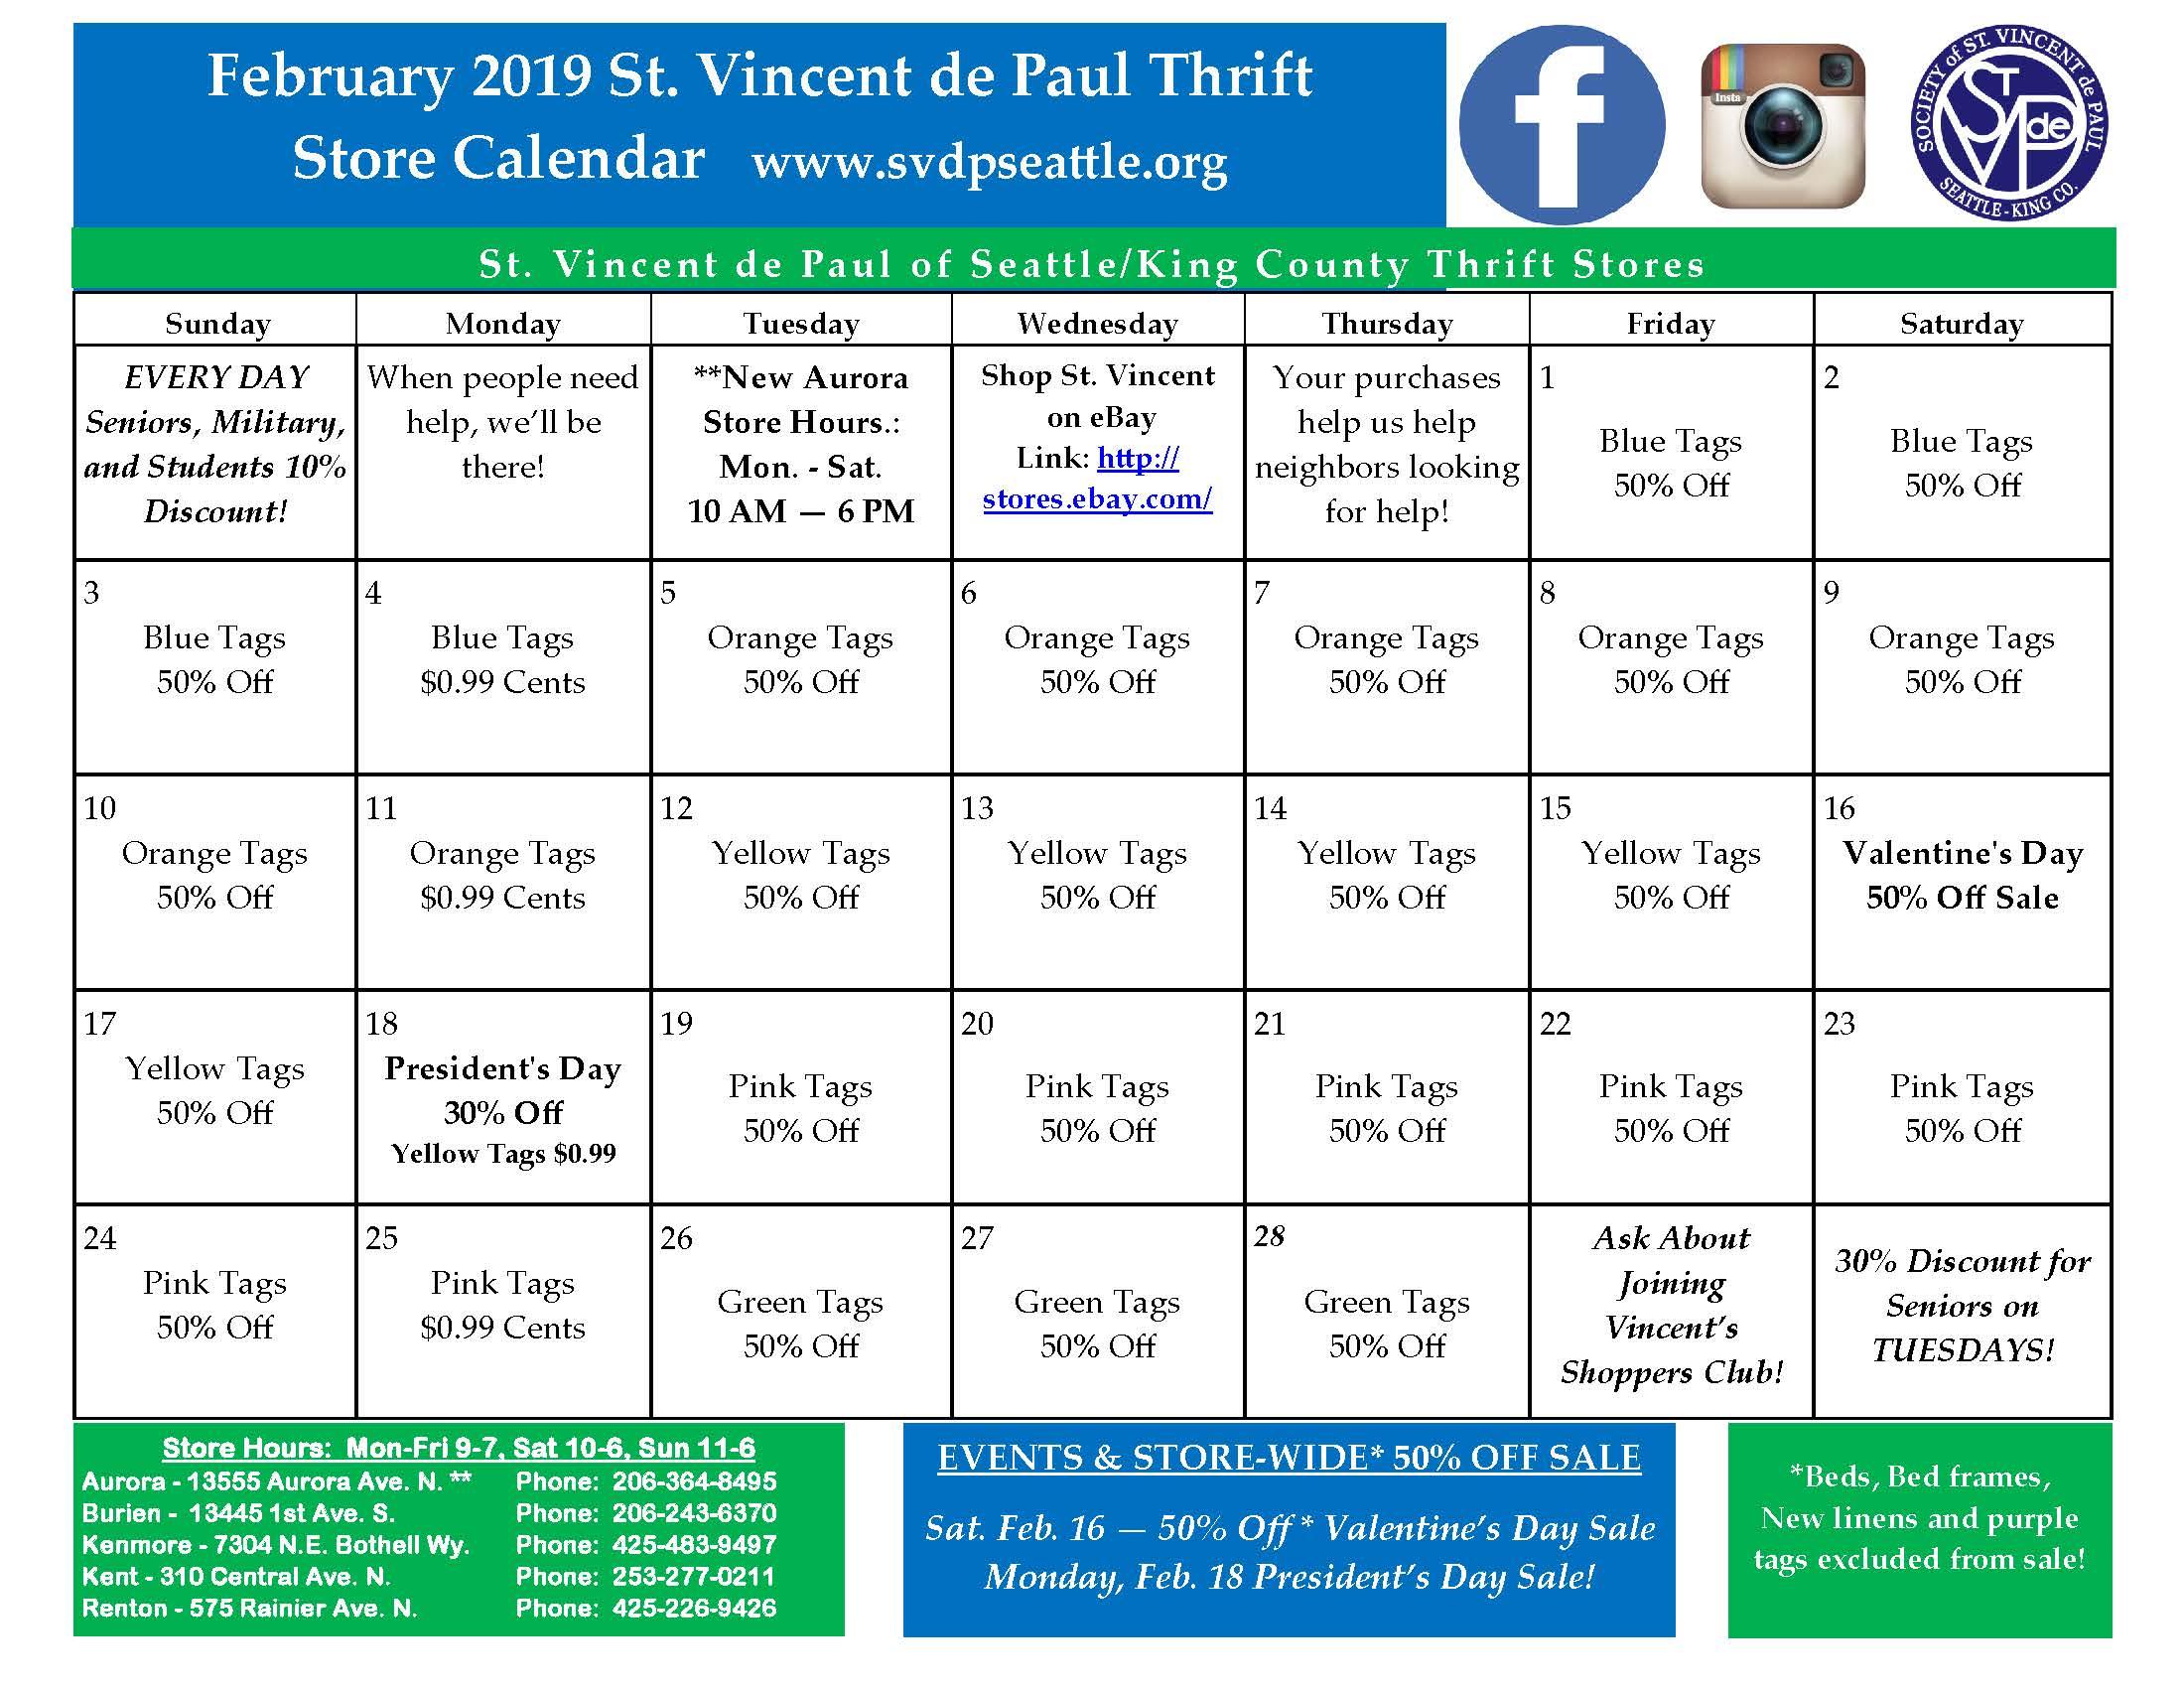 Feb 2019 Calendar Draft 1-30-19 J